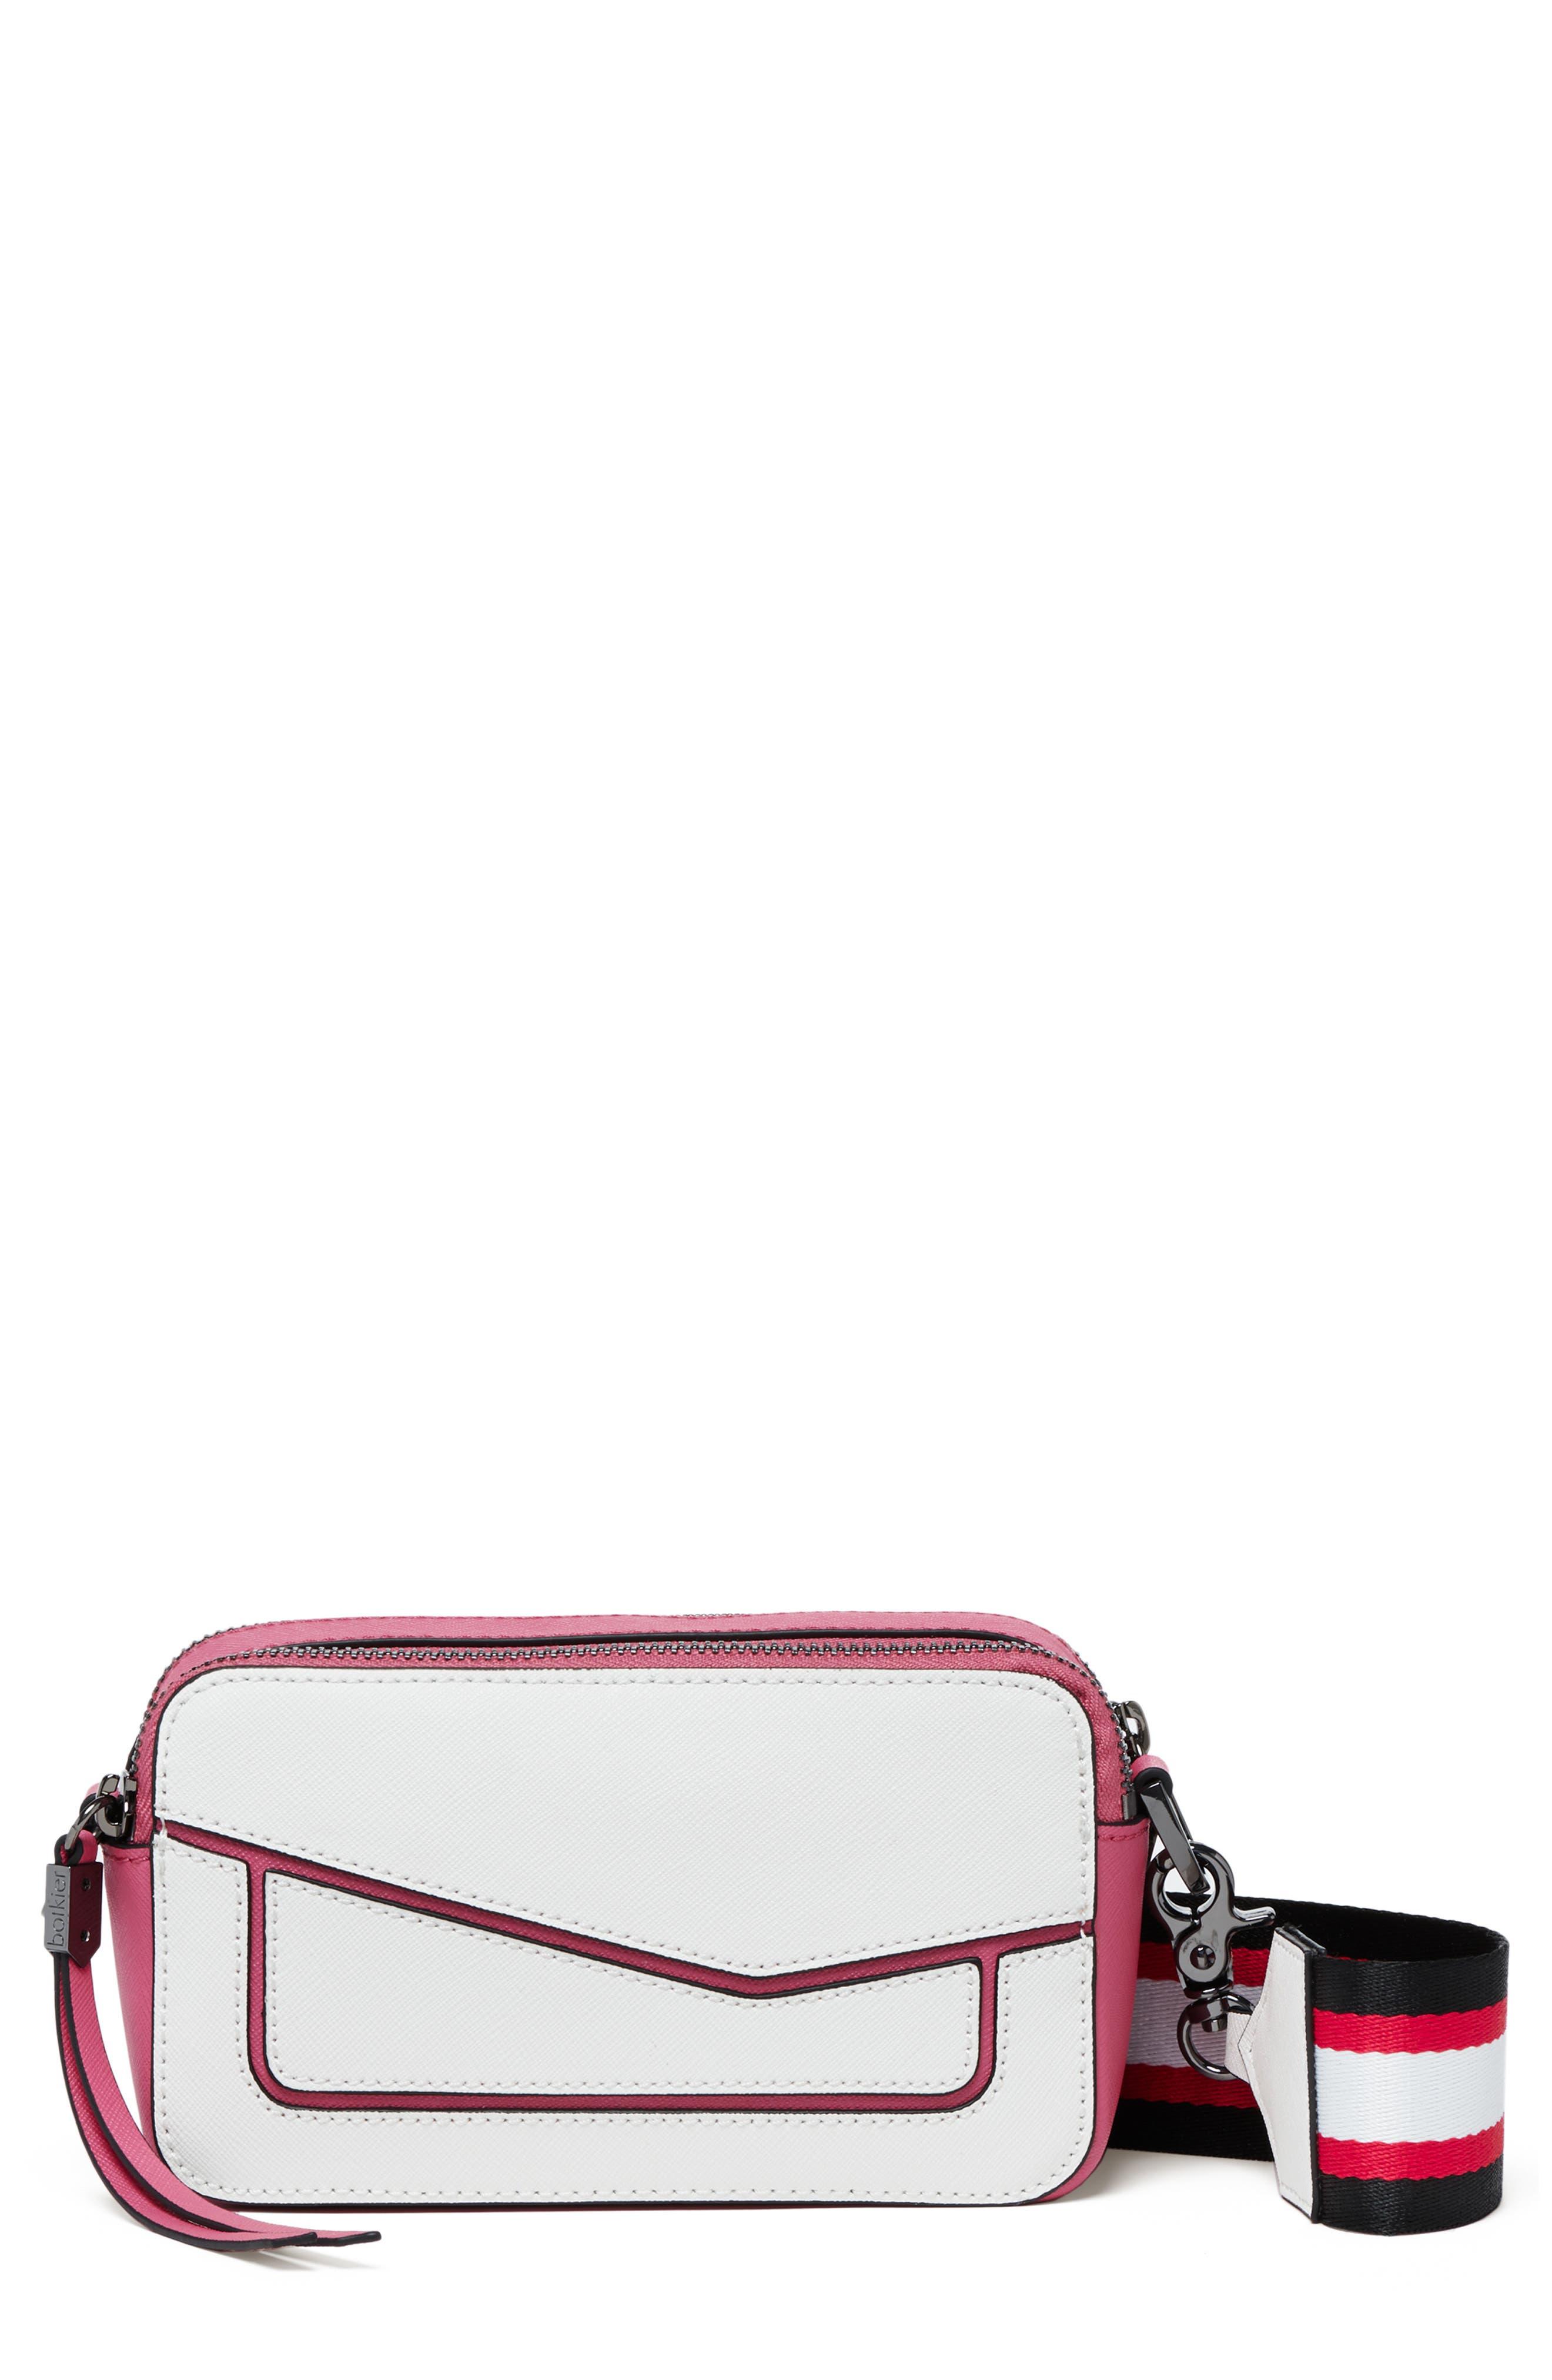 Cobble Hill Leather Convertible Camera Crossbody Bag, Main, color, MARSHMALLOW